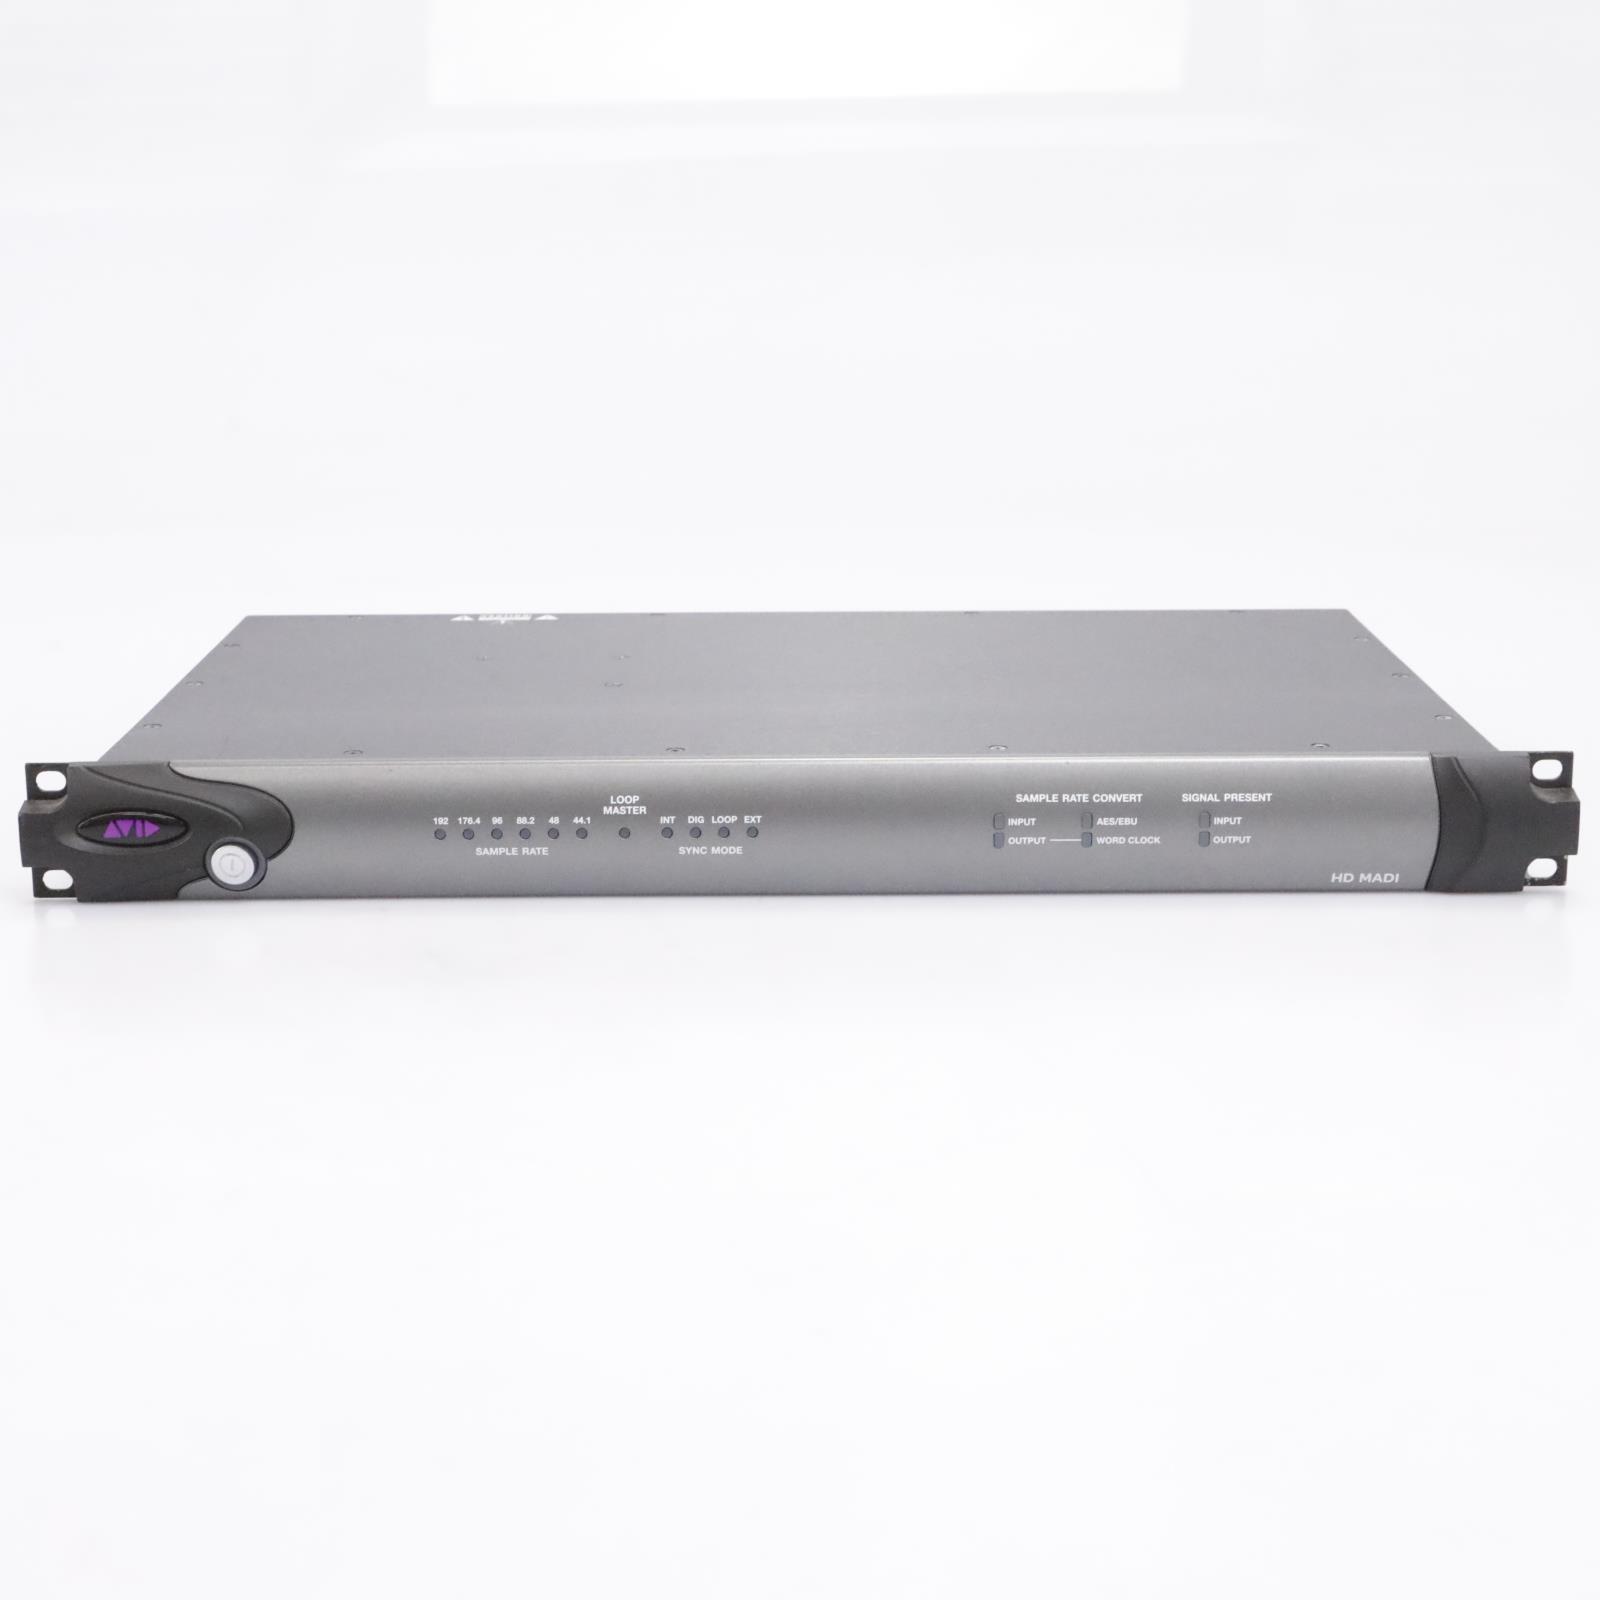 Avid HD MADI Protools HD Interface #43690